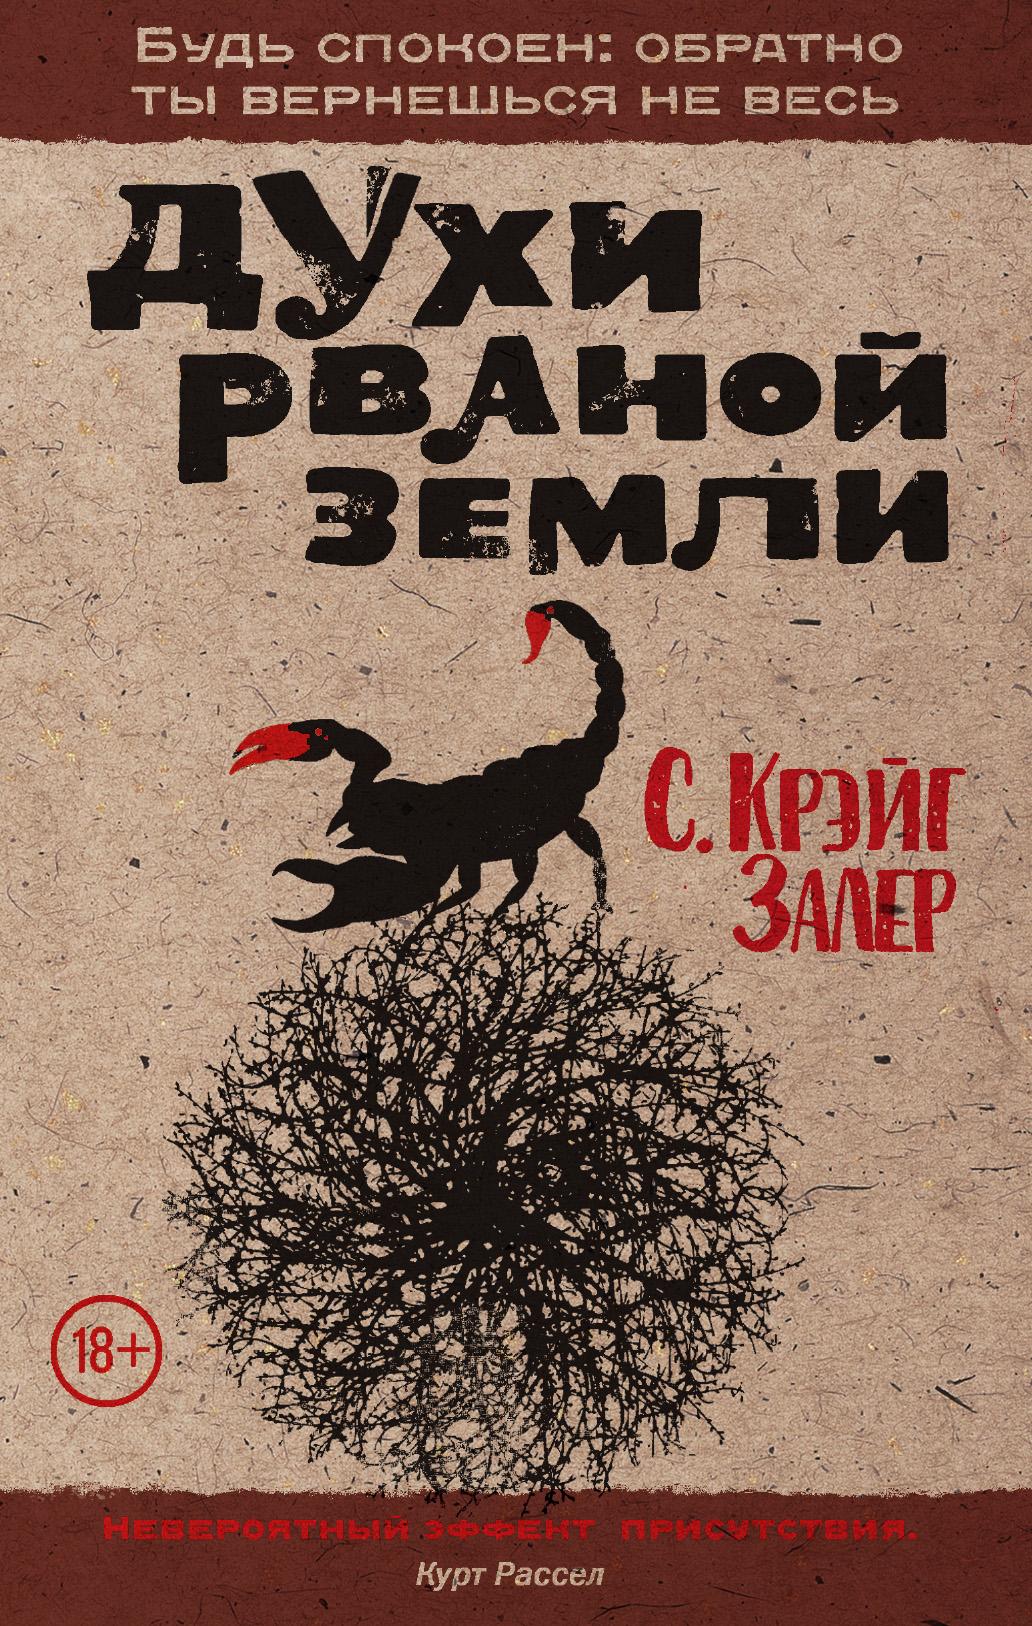 Духи рваной земли ( Крэйг С. Залер  )